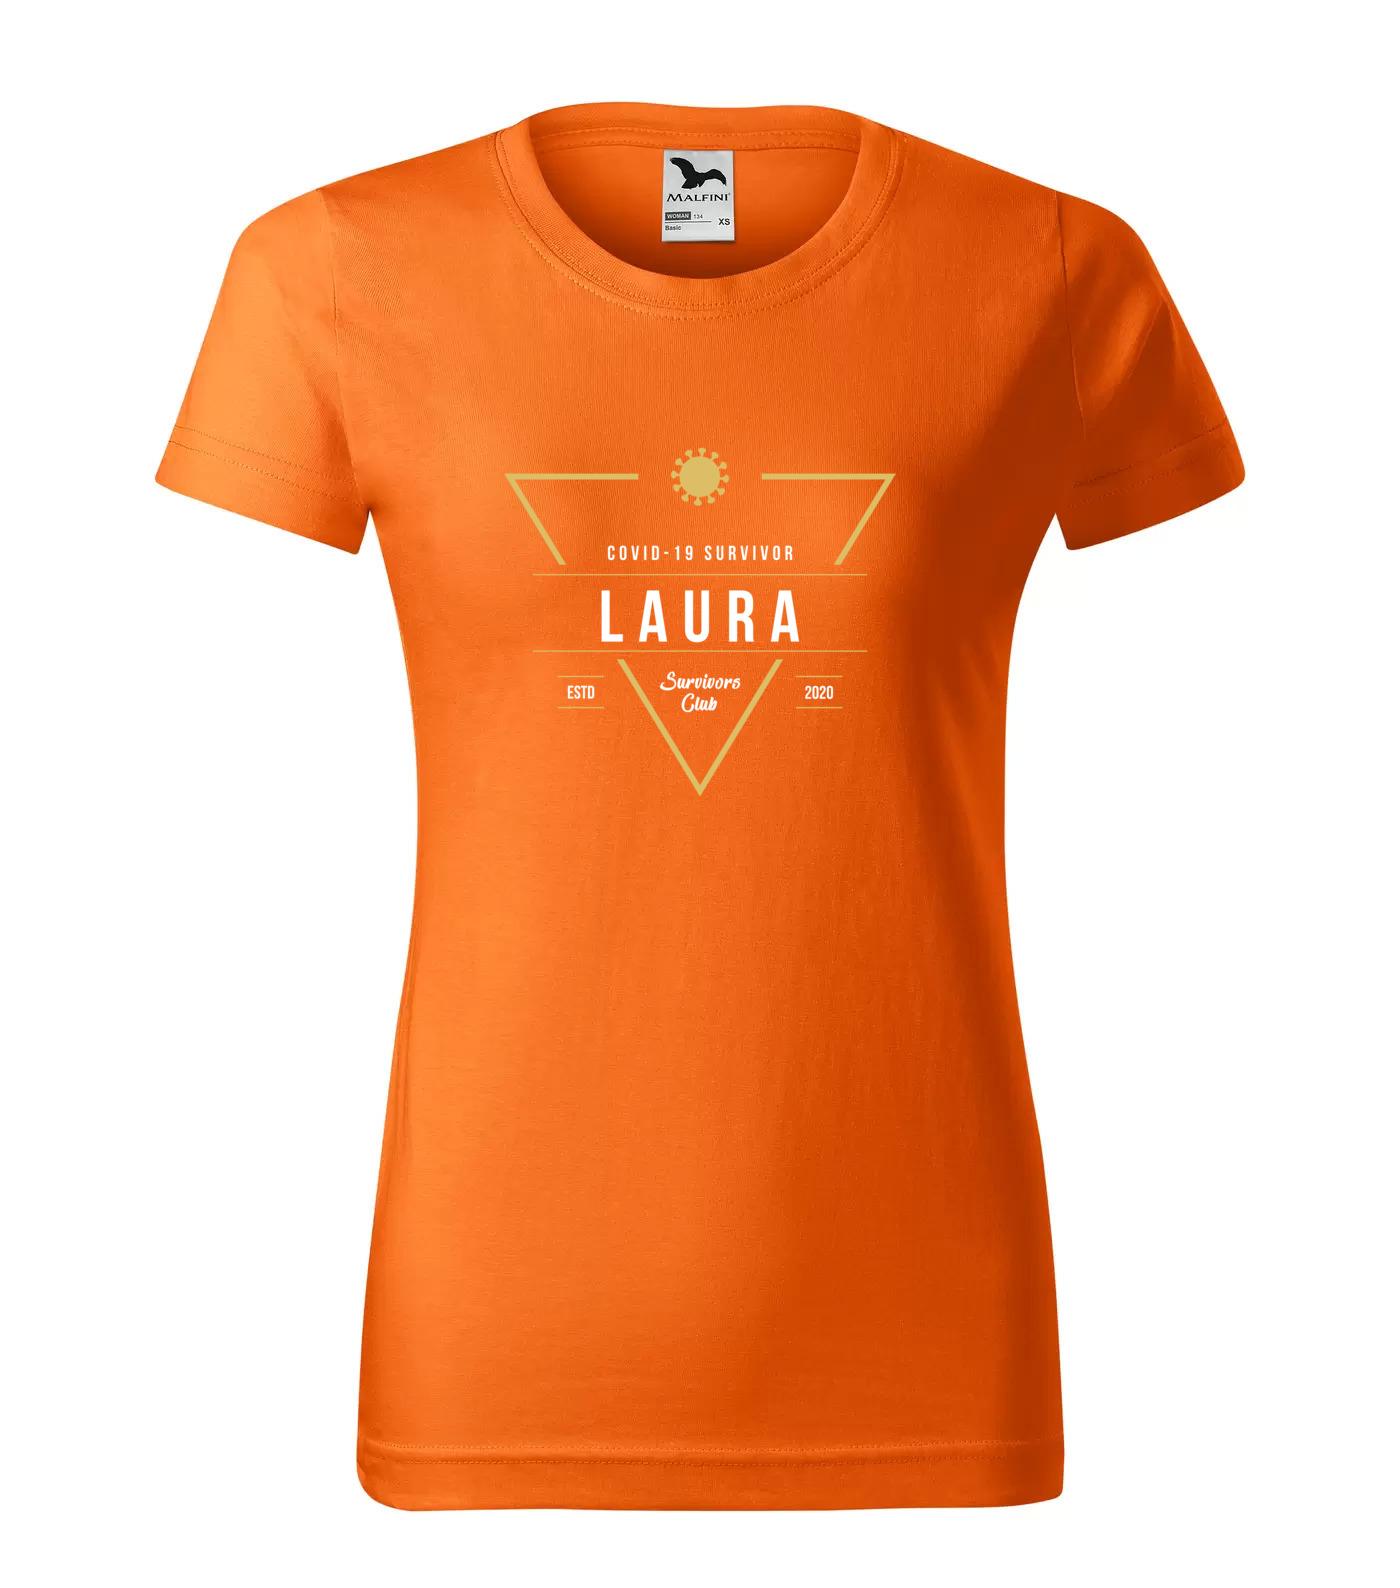 Tričko Survivor Club Laura